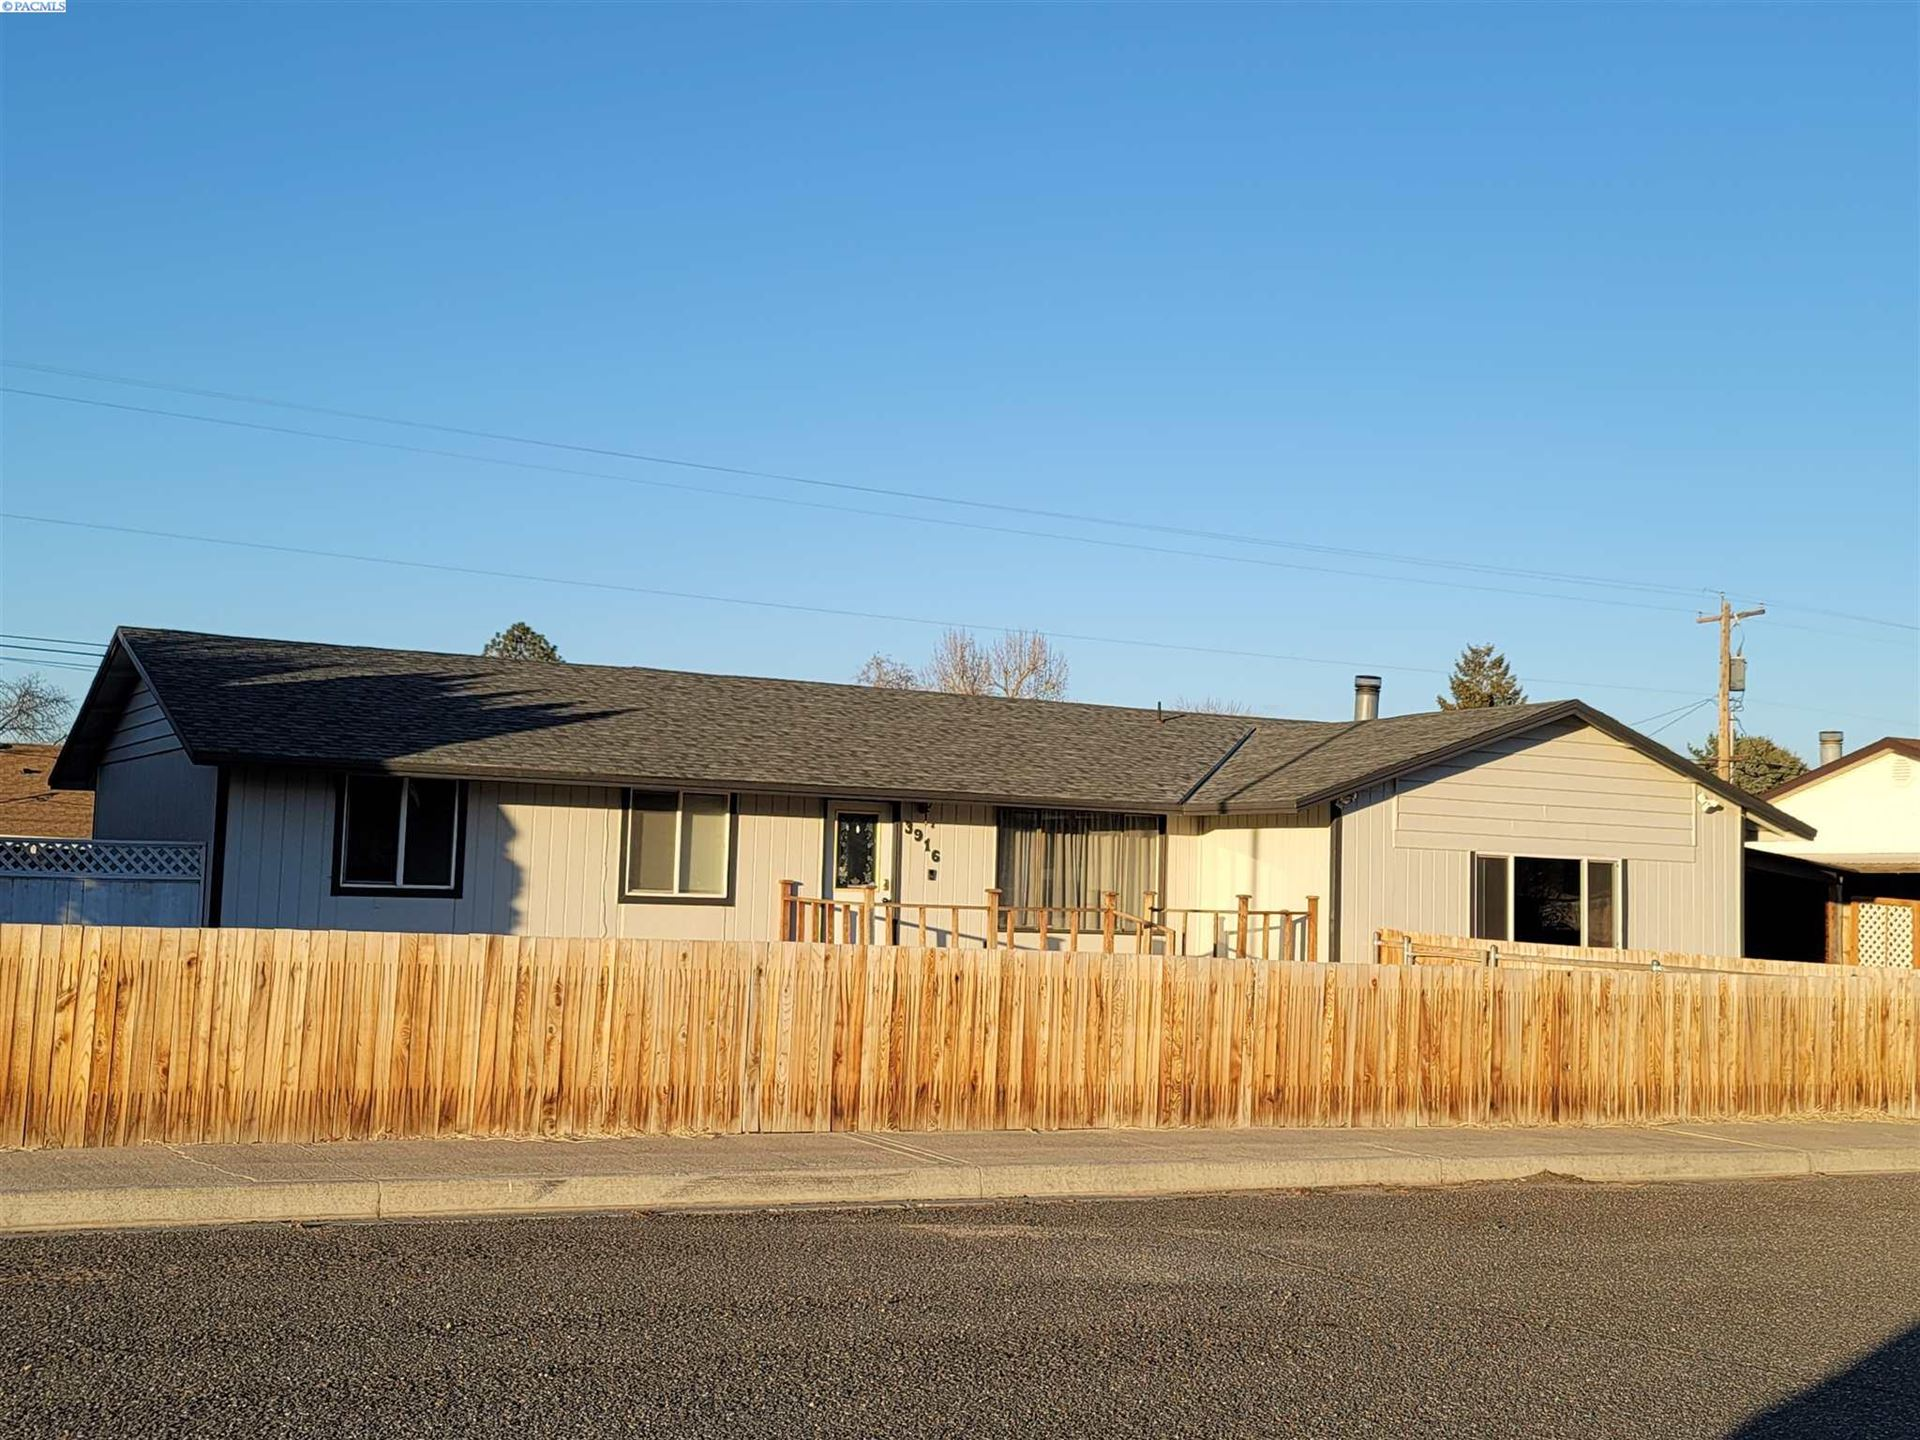 Photo of 3916 W 3rd Ave, Kennewick, WA 99336 (MLS # 251580)